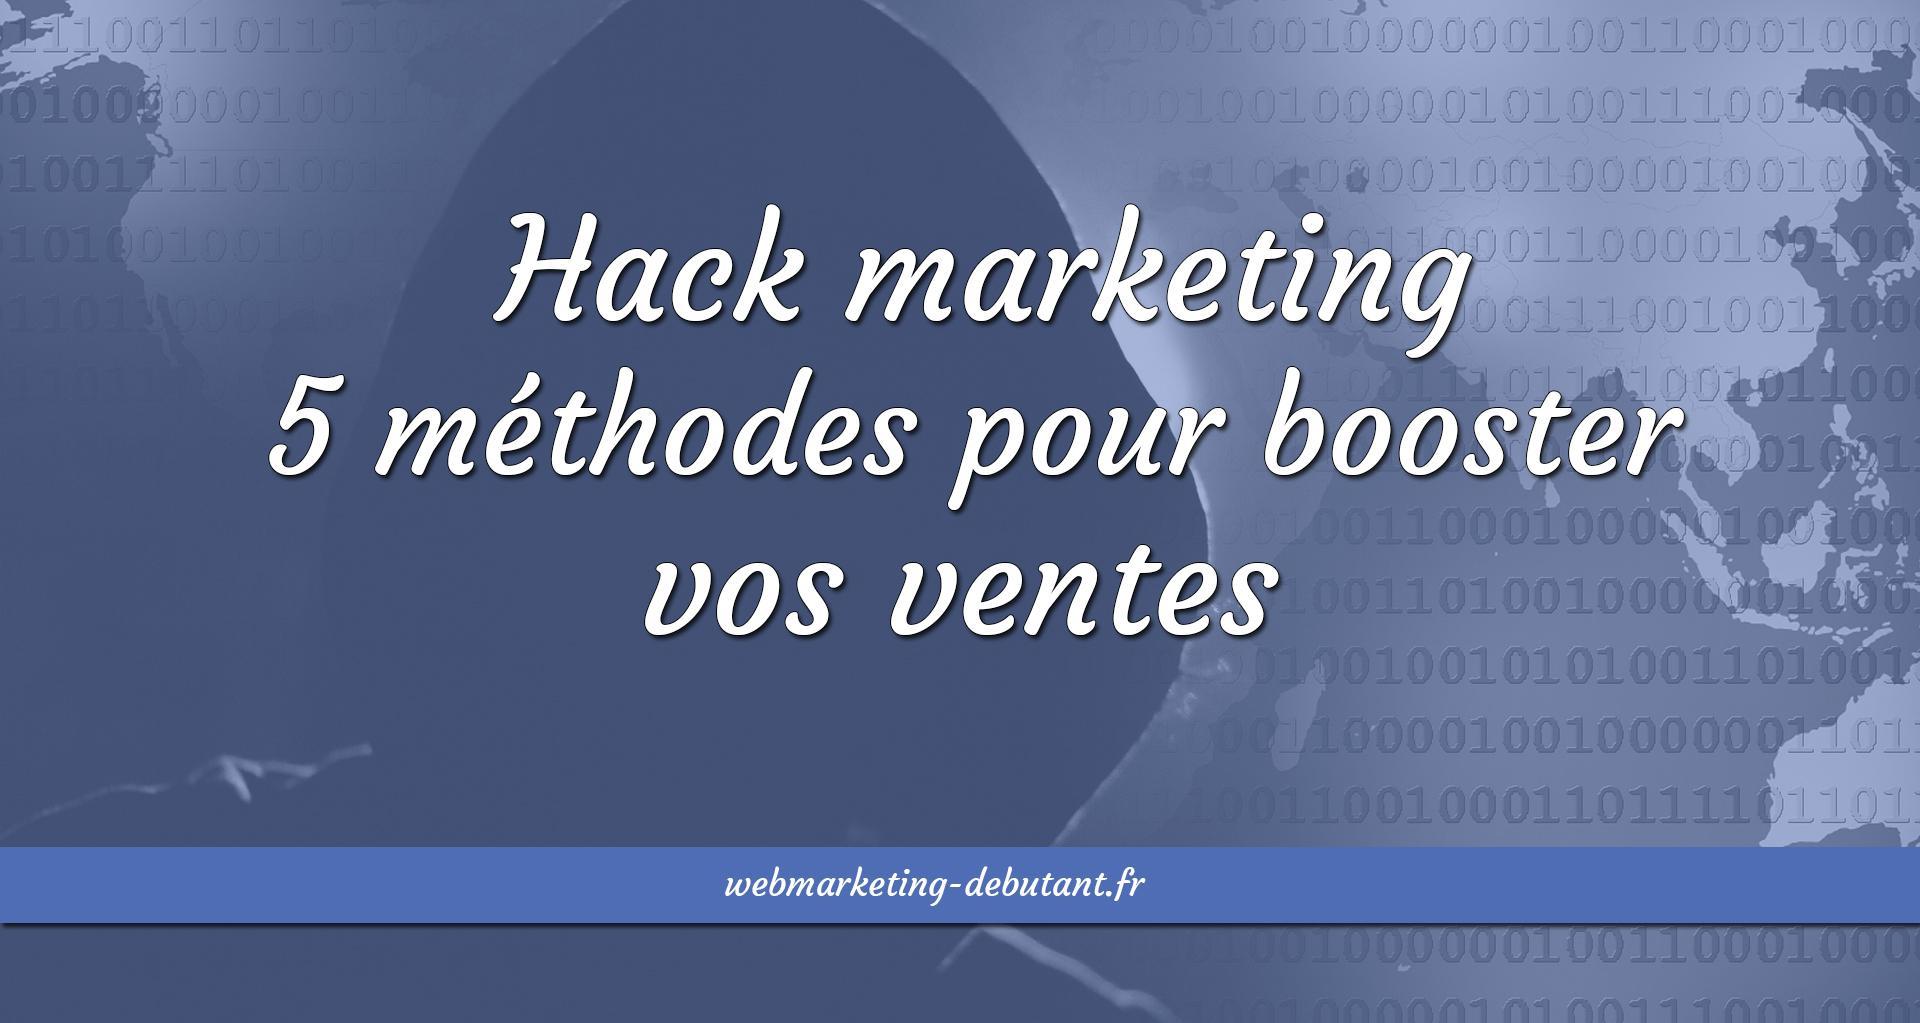 hack marketing